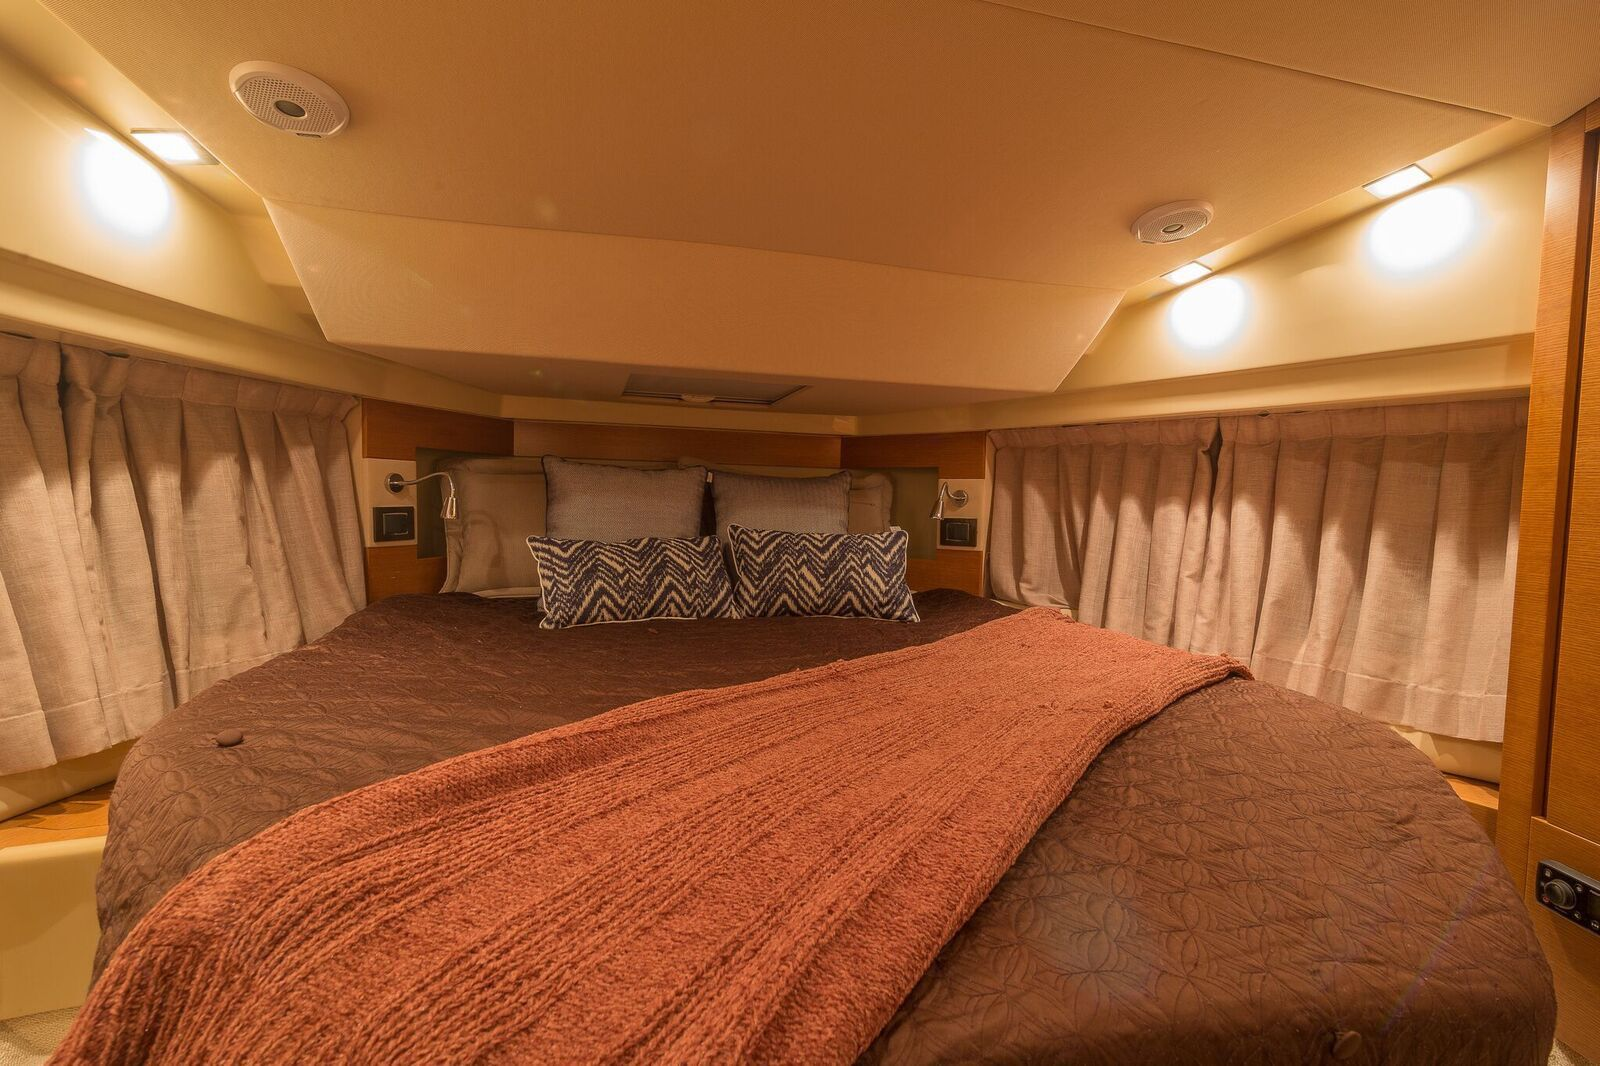 Charter a vandutch yacht in miami haute charters will get